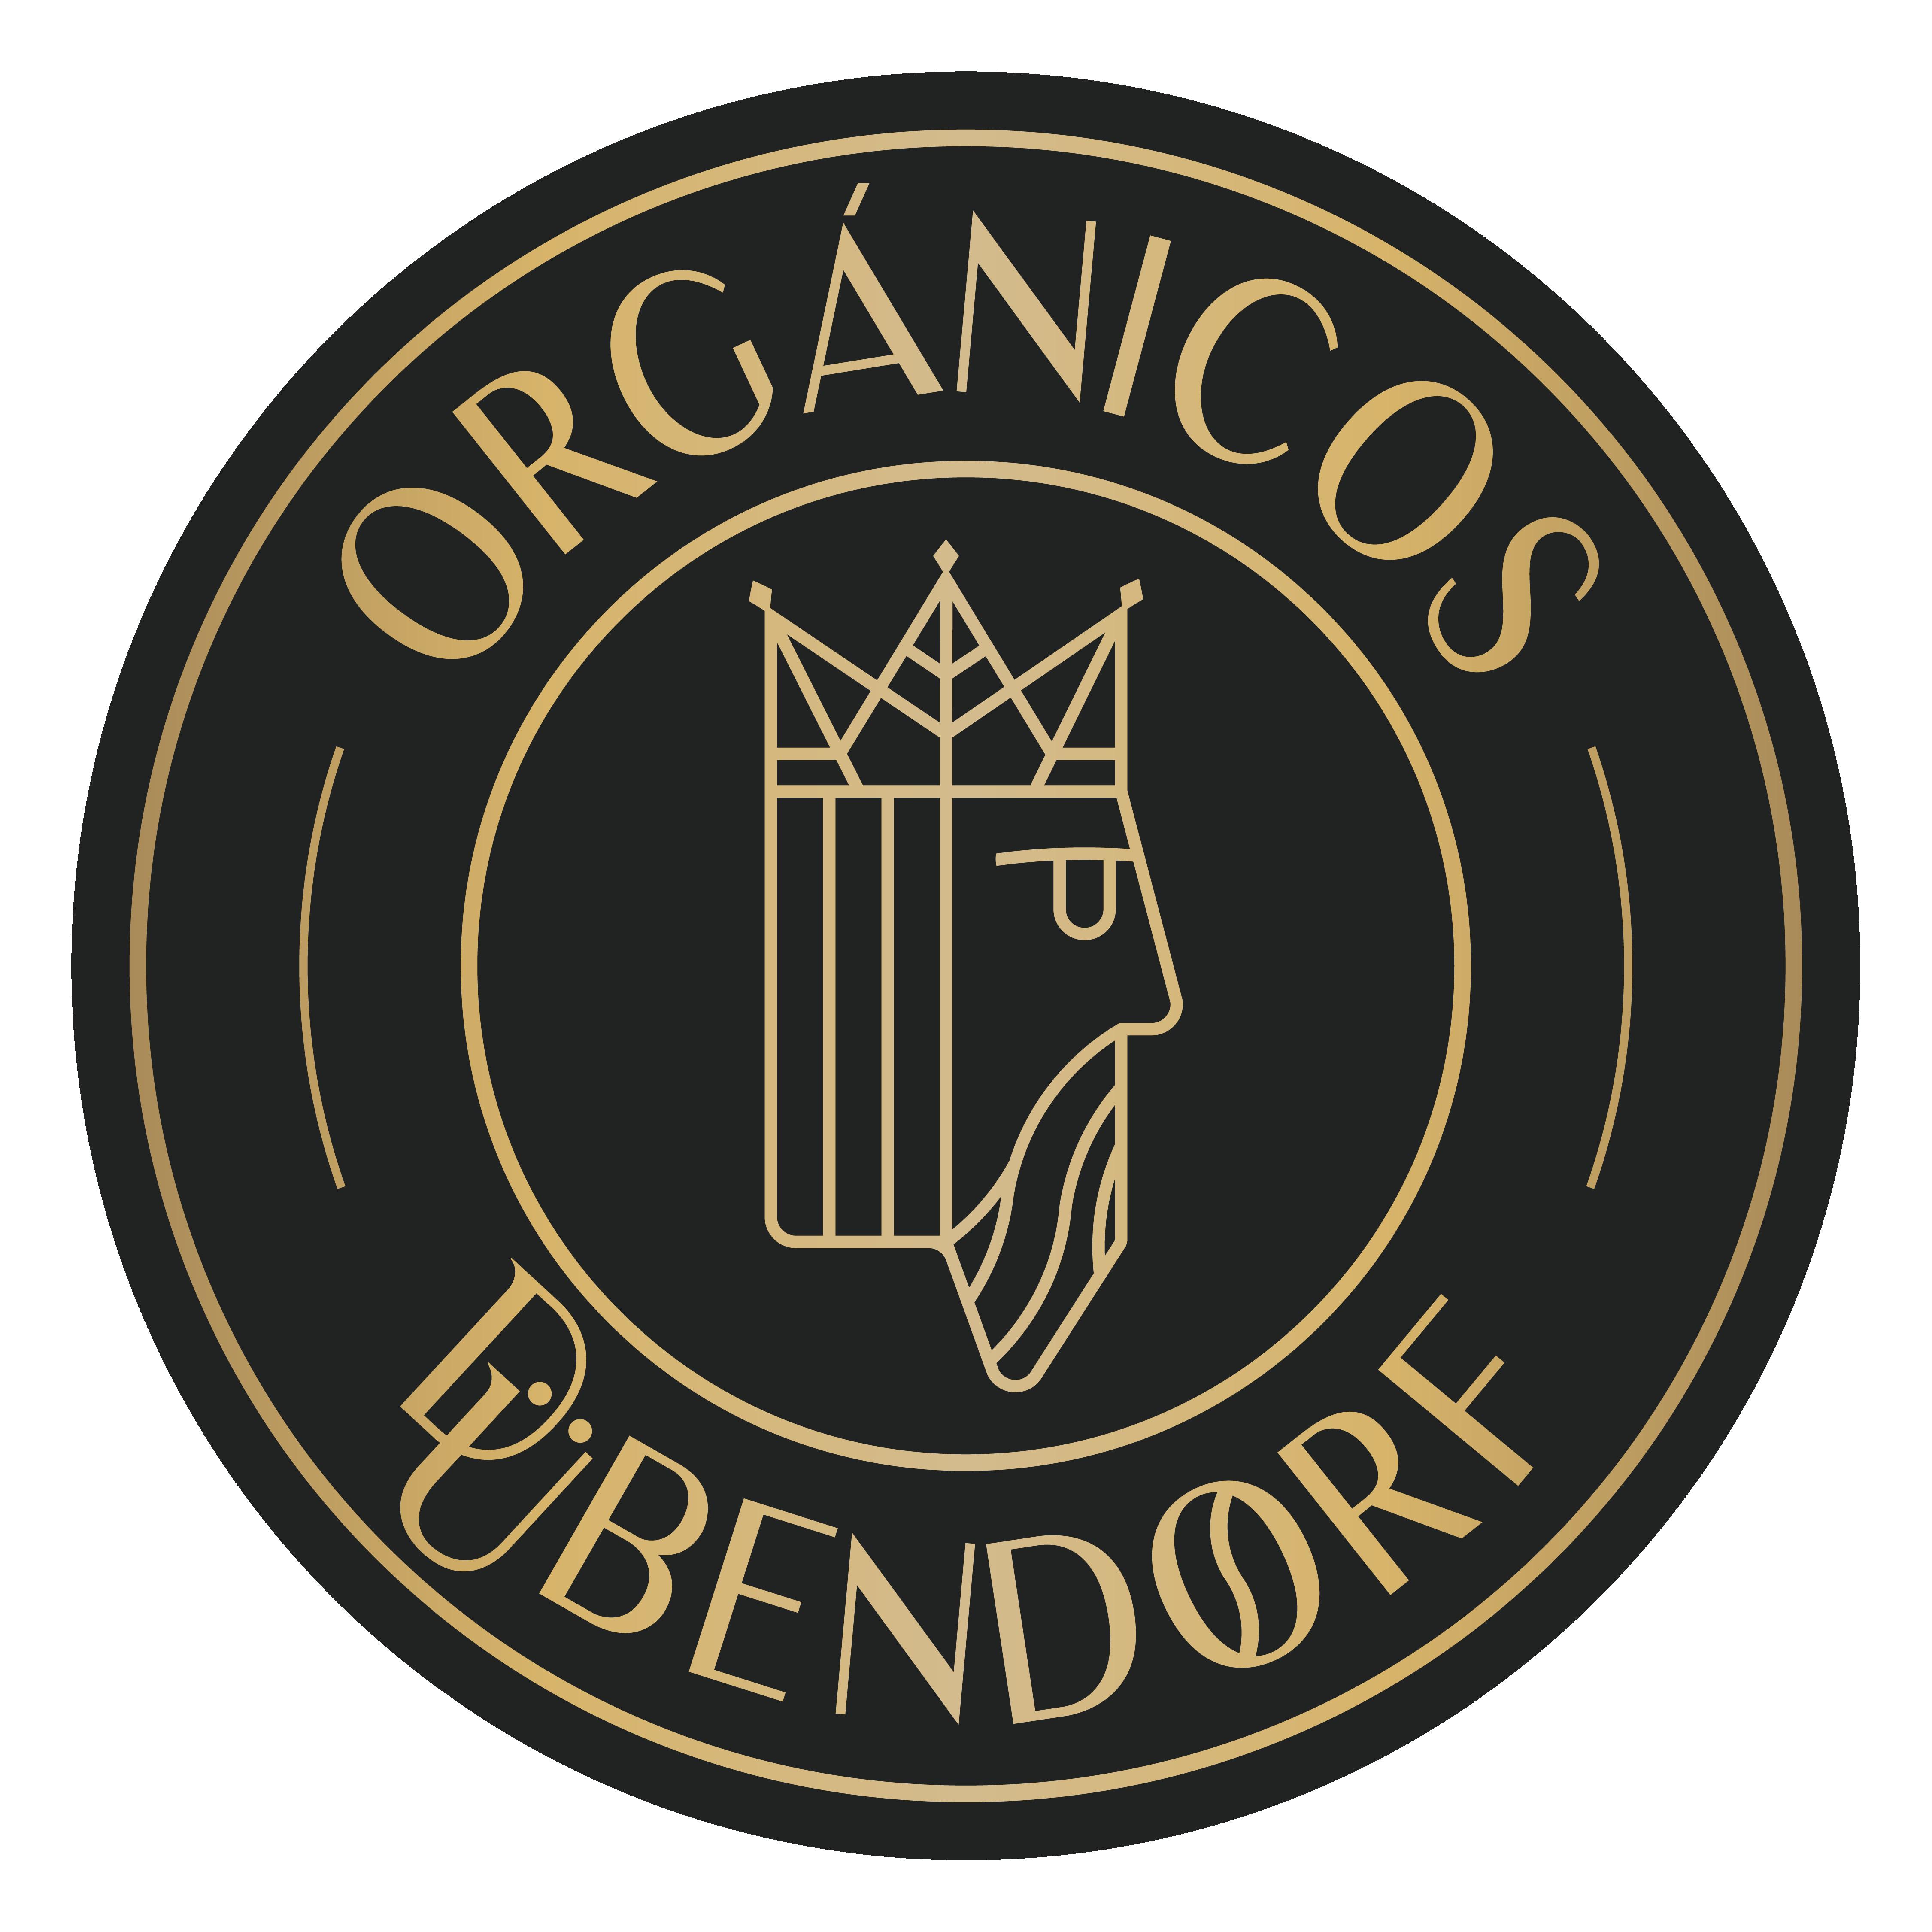 PRODUCTOS ORGANICOS DUBENDORF